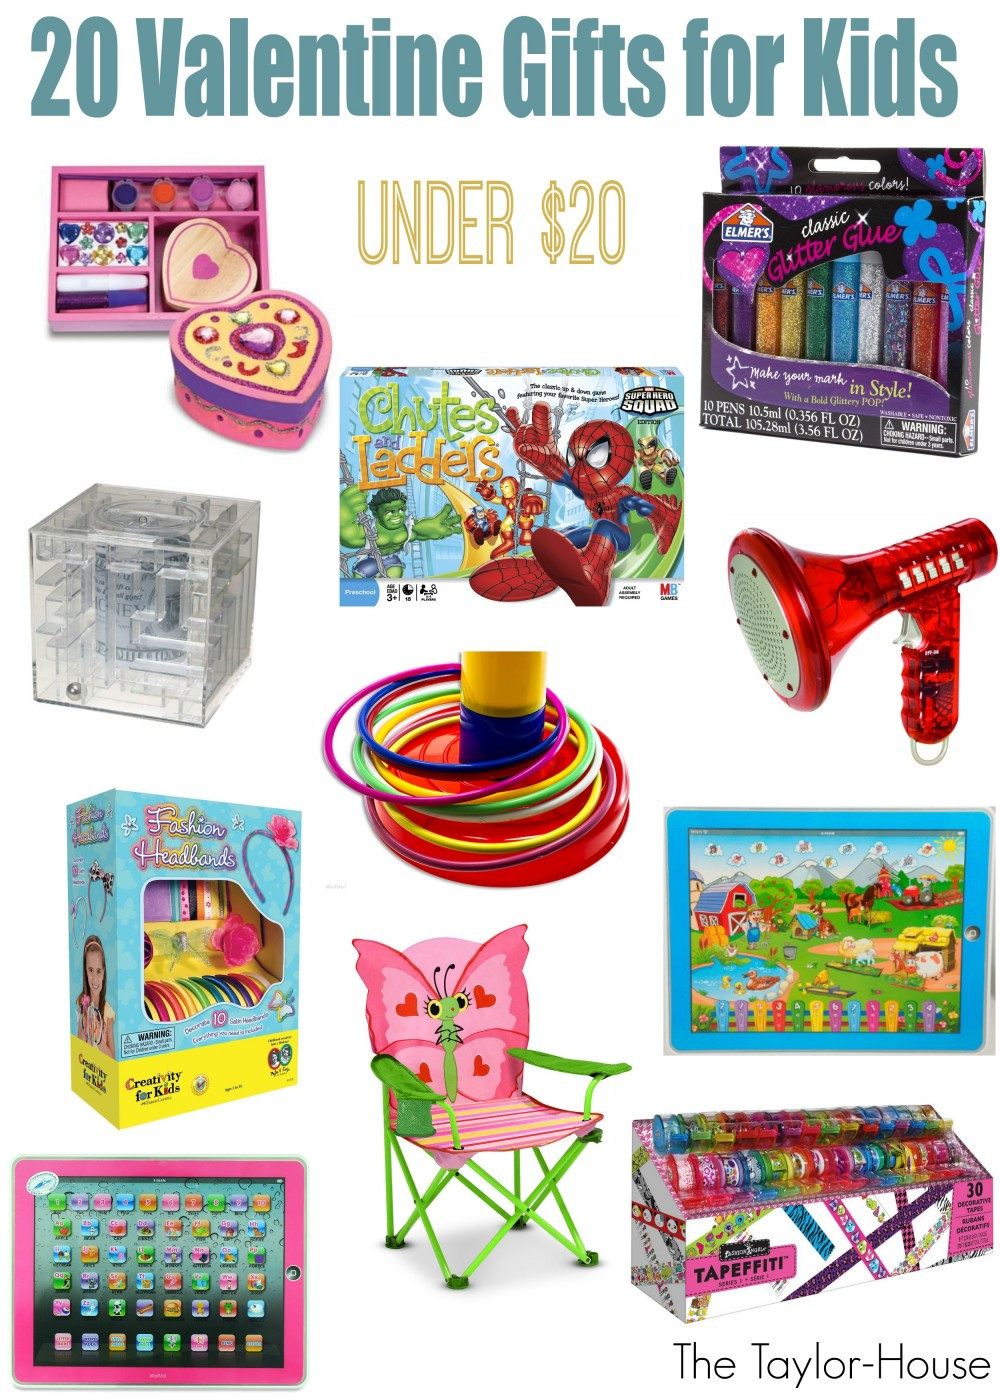 Toddler Valentines Day Gift Ideas  Valentine Gift Ideas for Kids